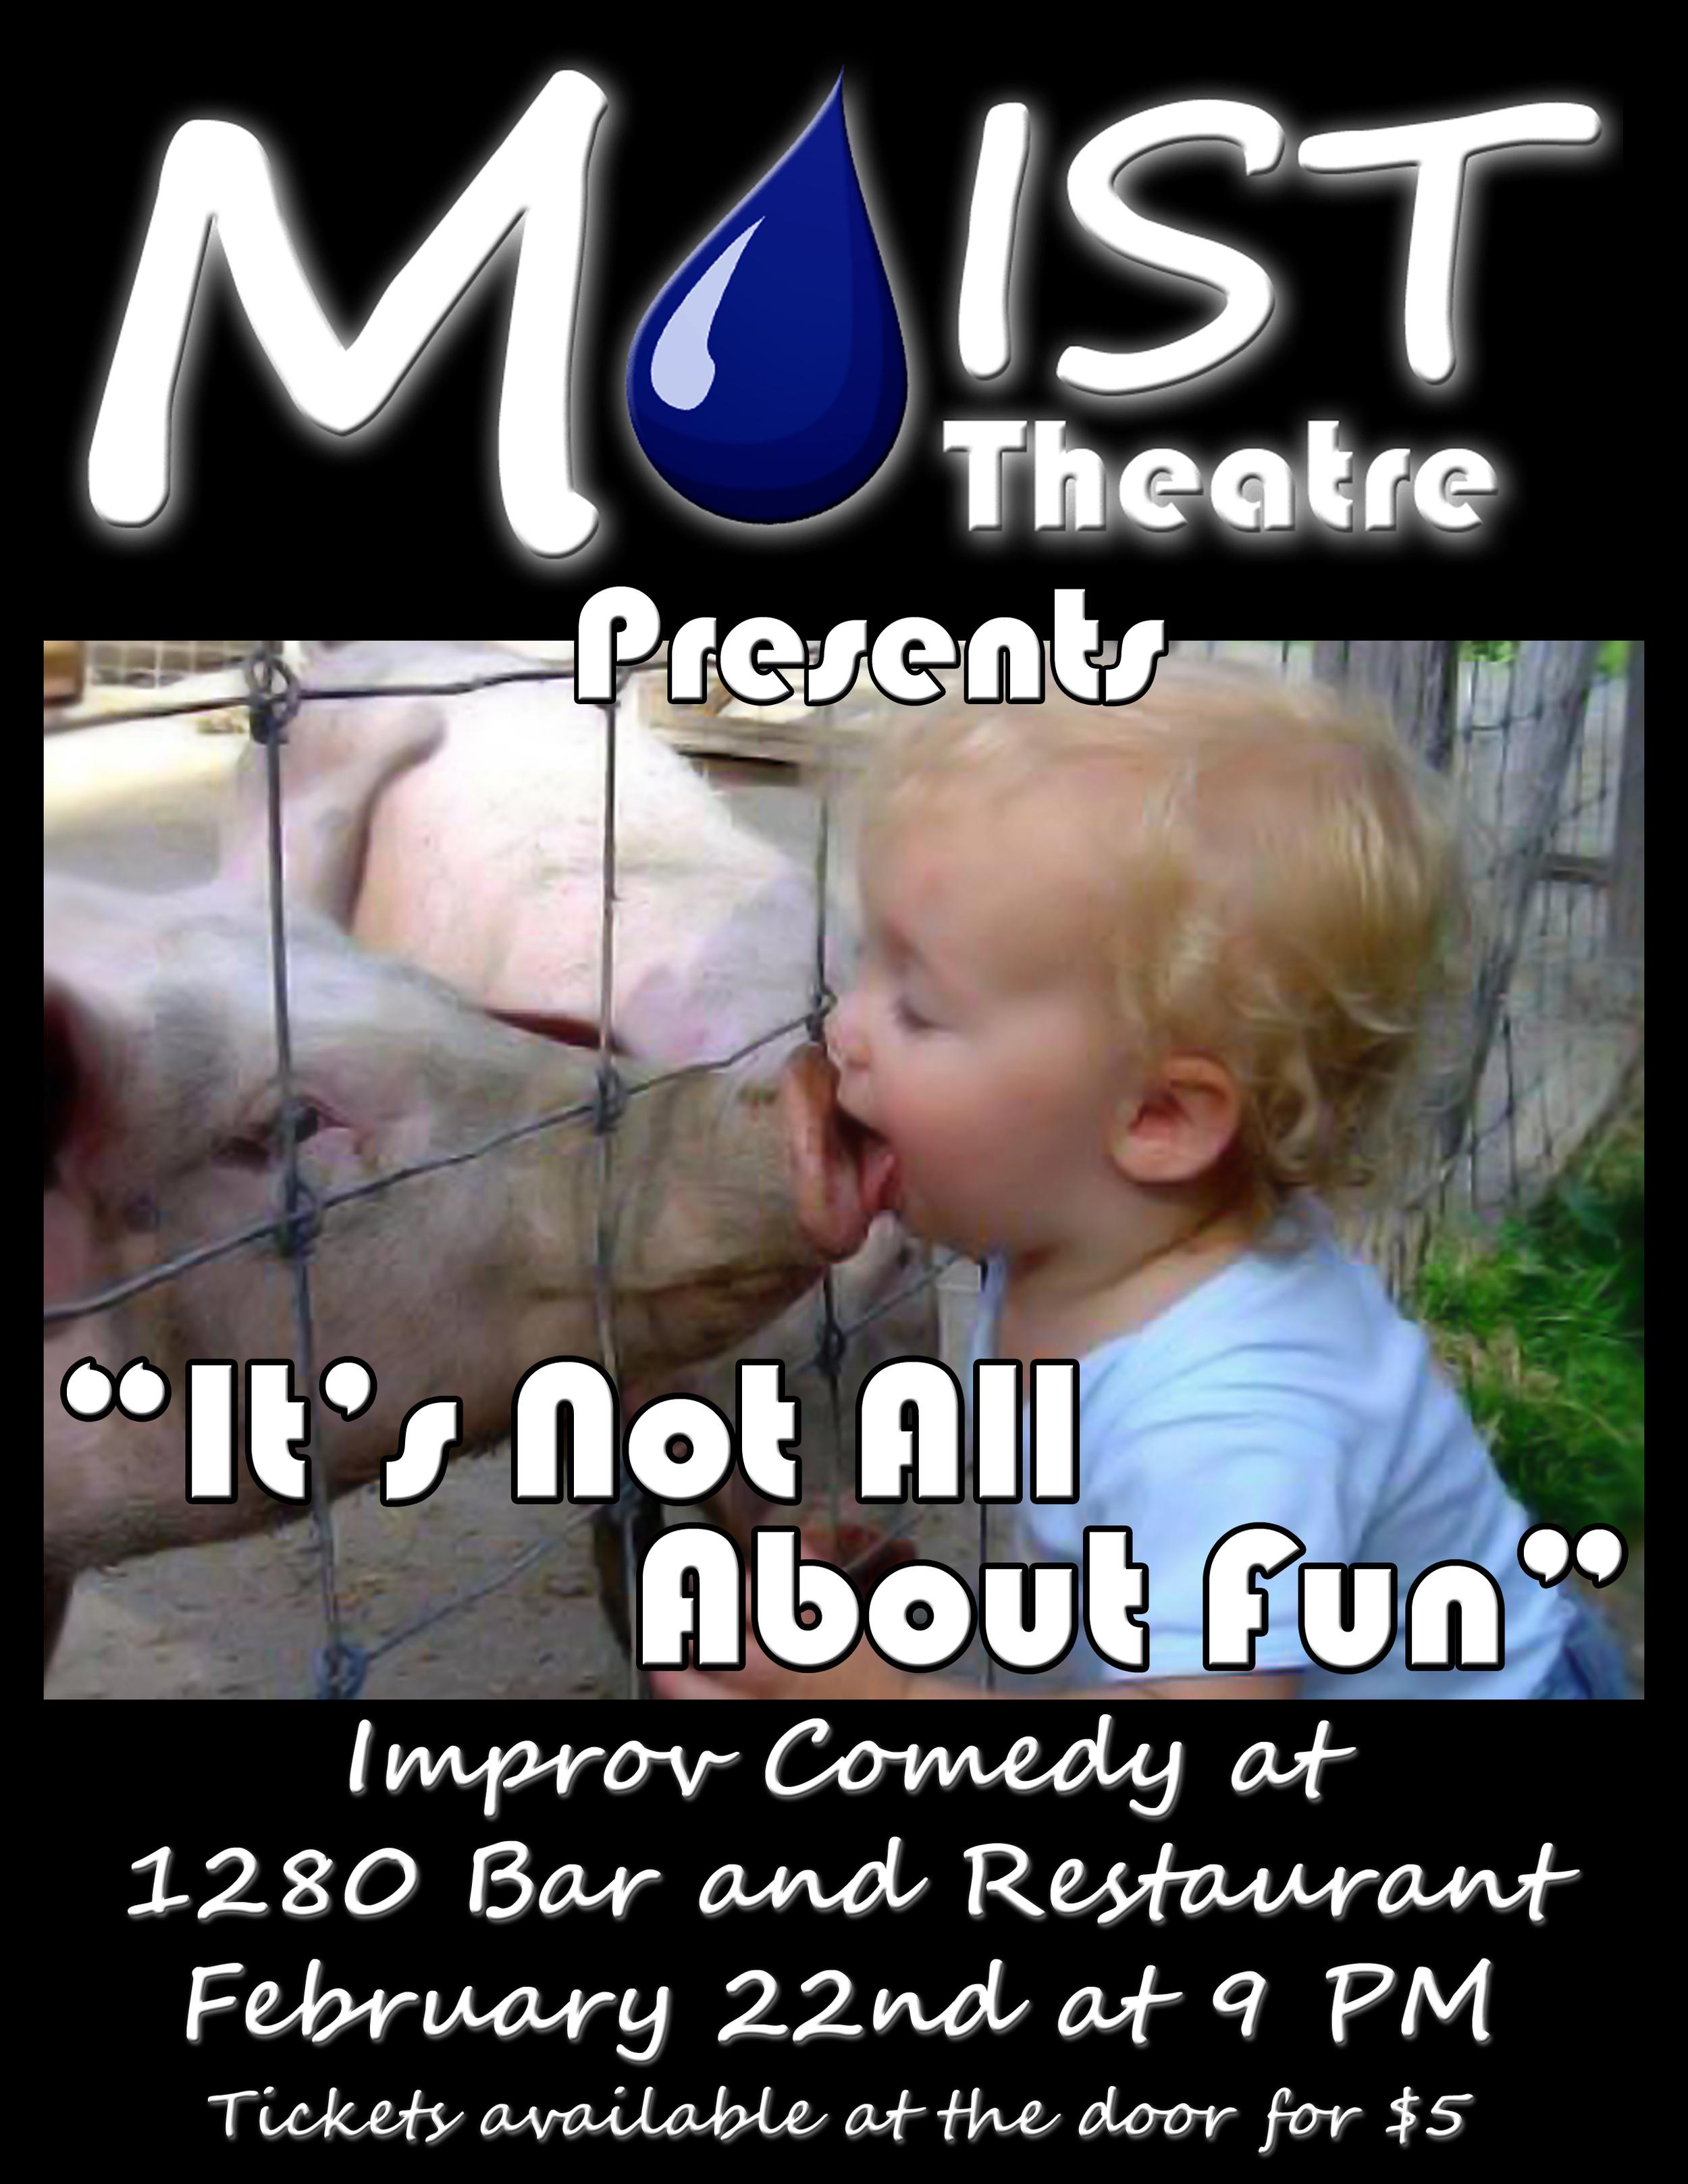 Not about Fun - Pig Lick.jpg